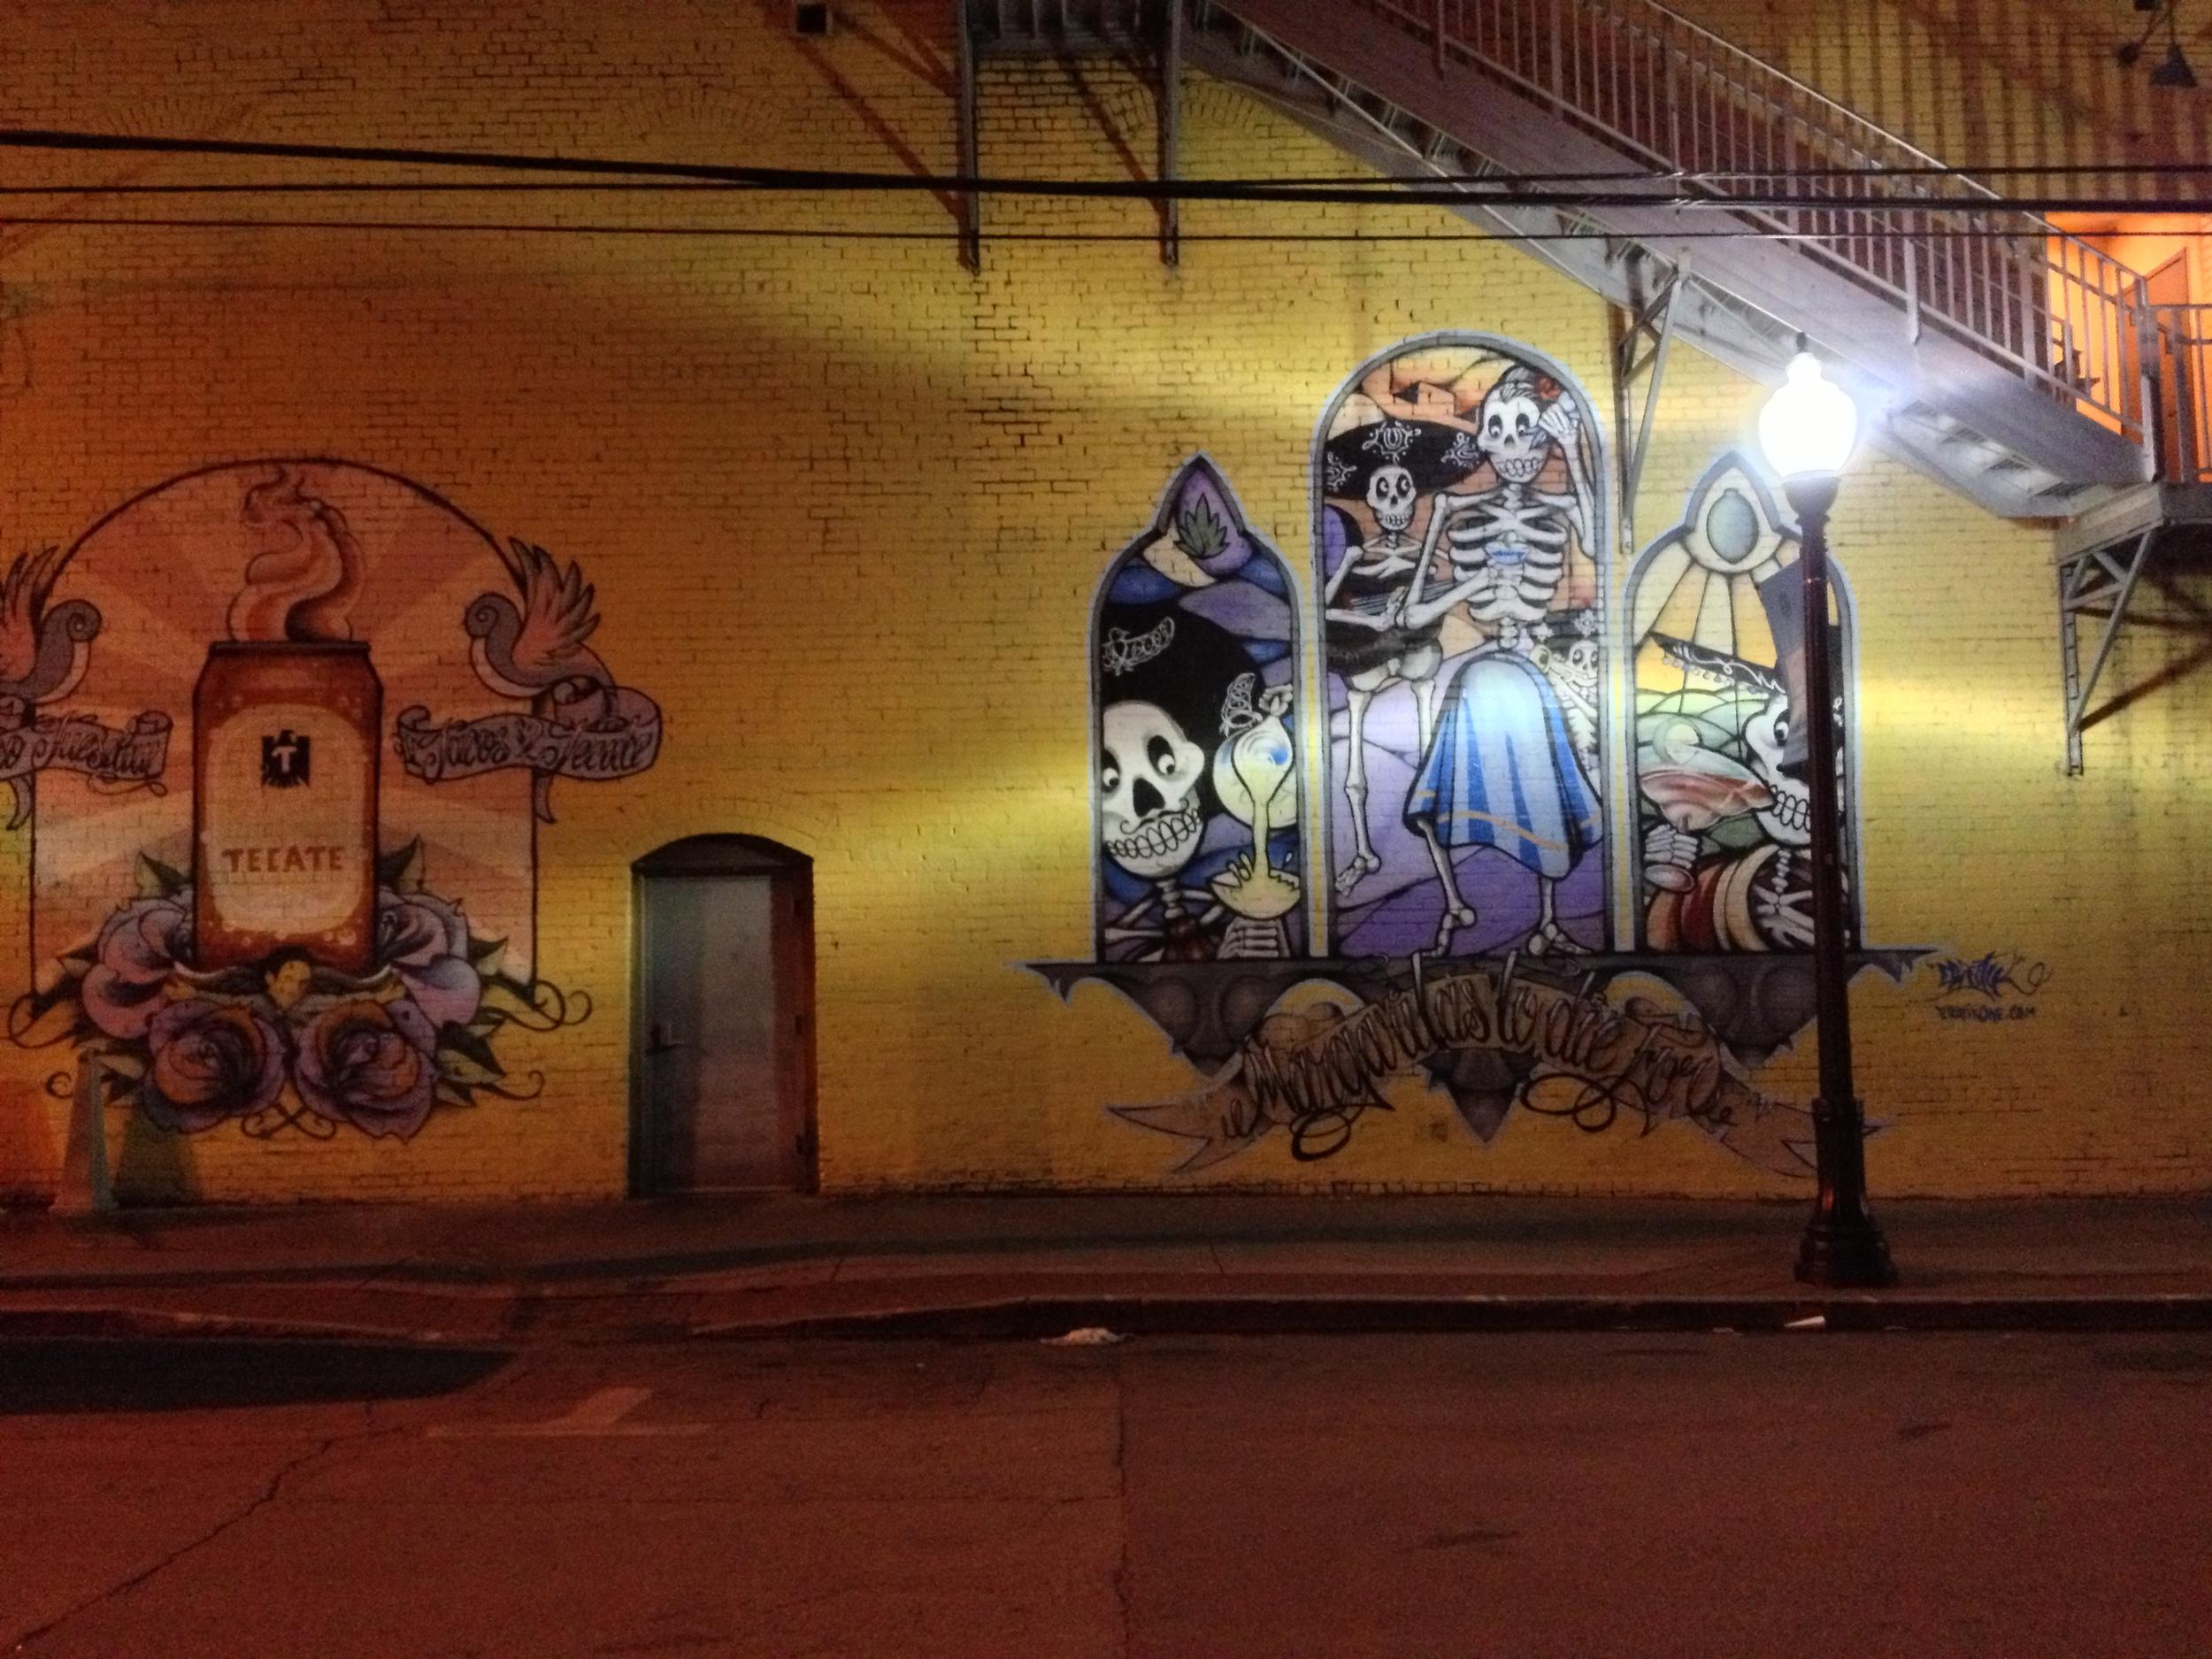 Tulsa Wall Art at El Guapo Restaurant in DOwntown